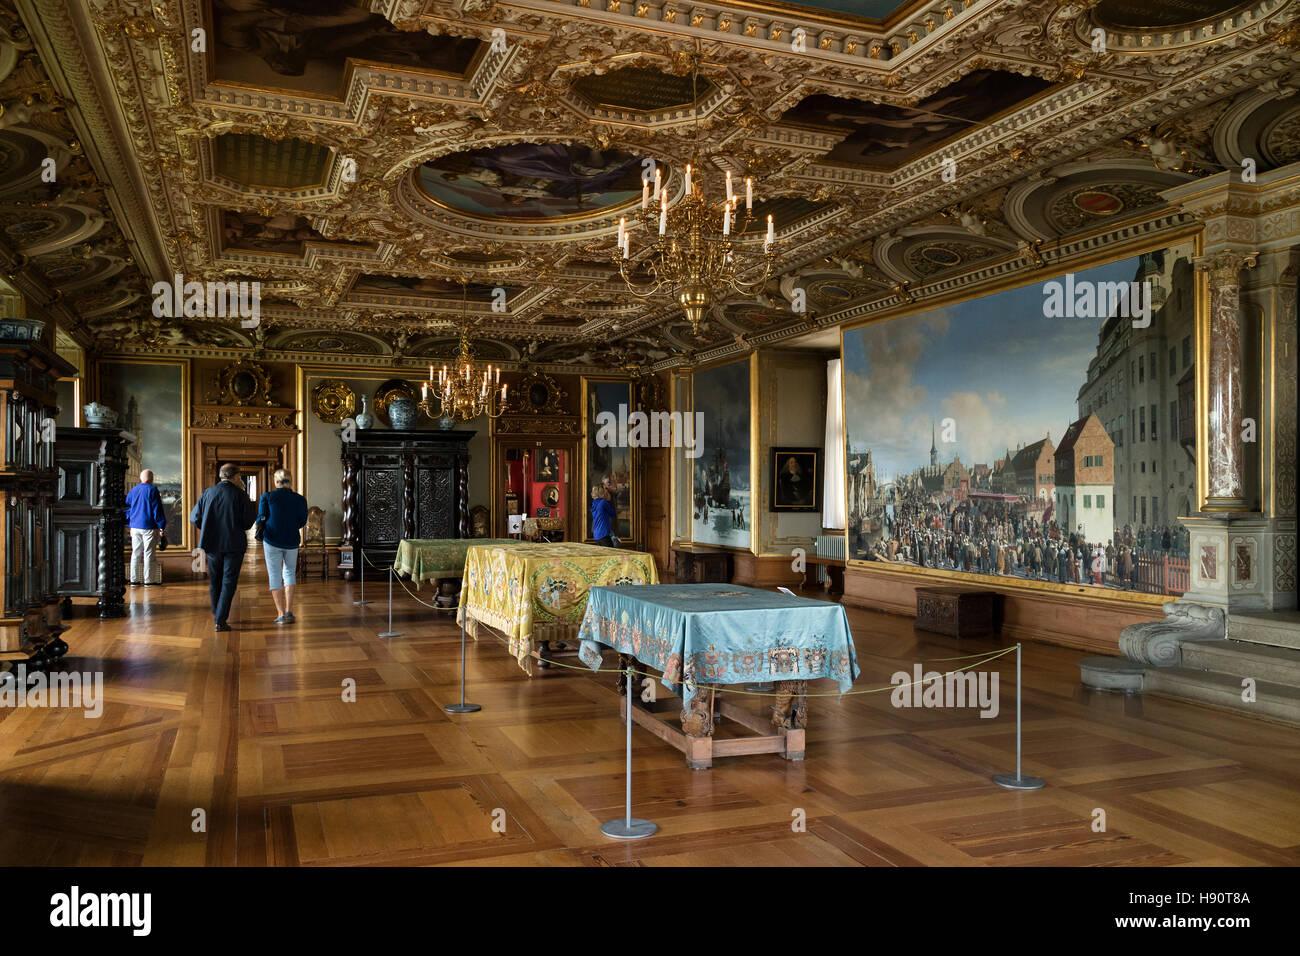 Decorated ceiling in Frederiksborg Castle in Hillerod, Denmark - Stock Image